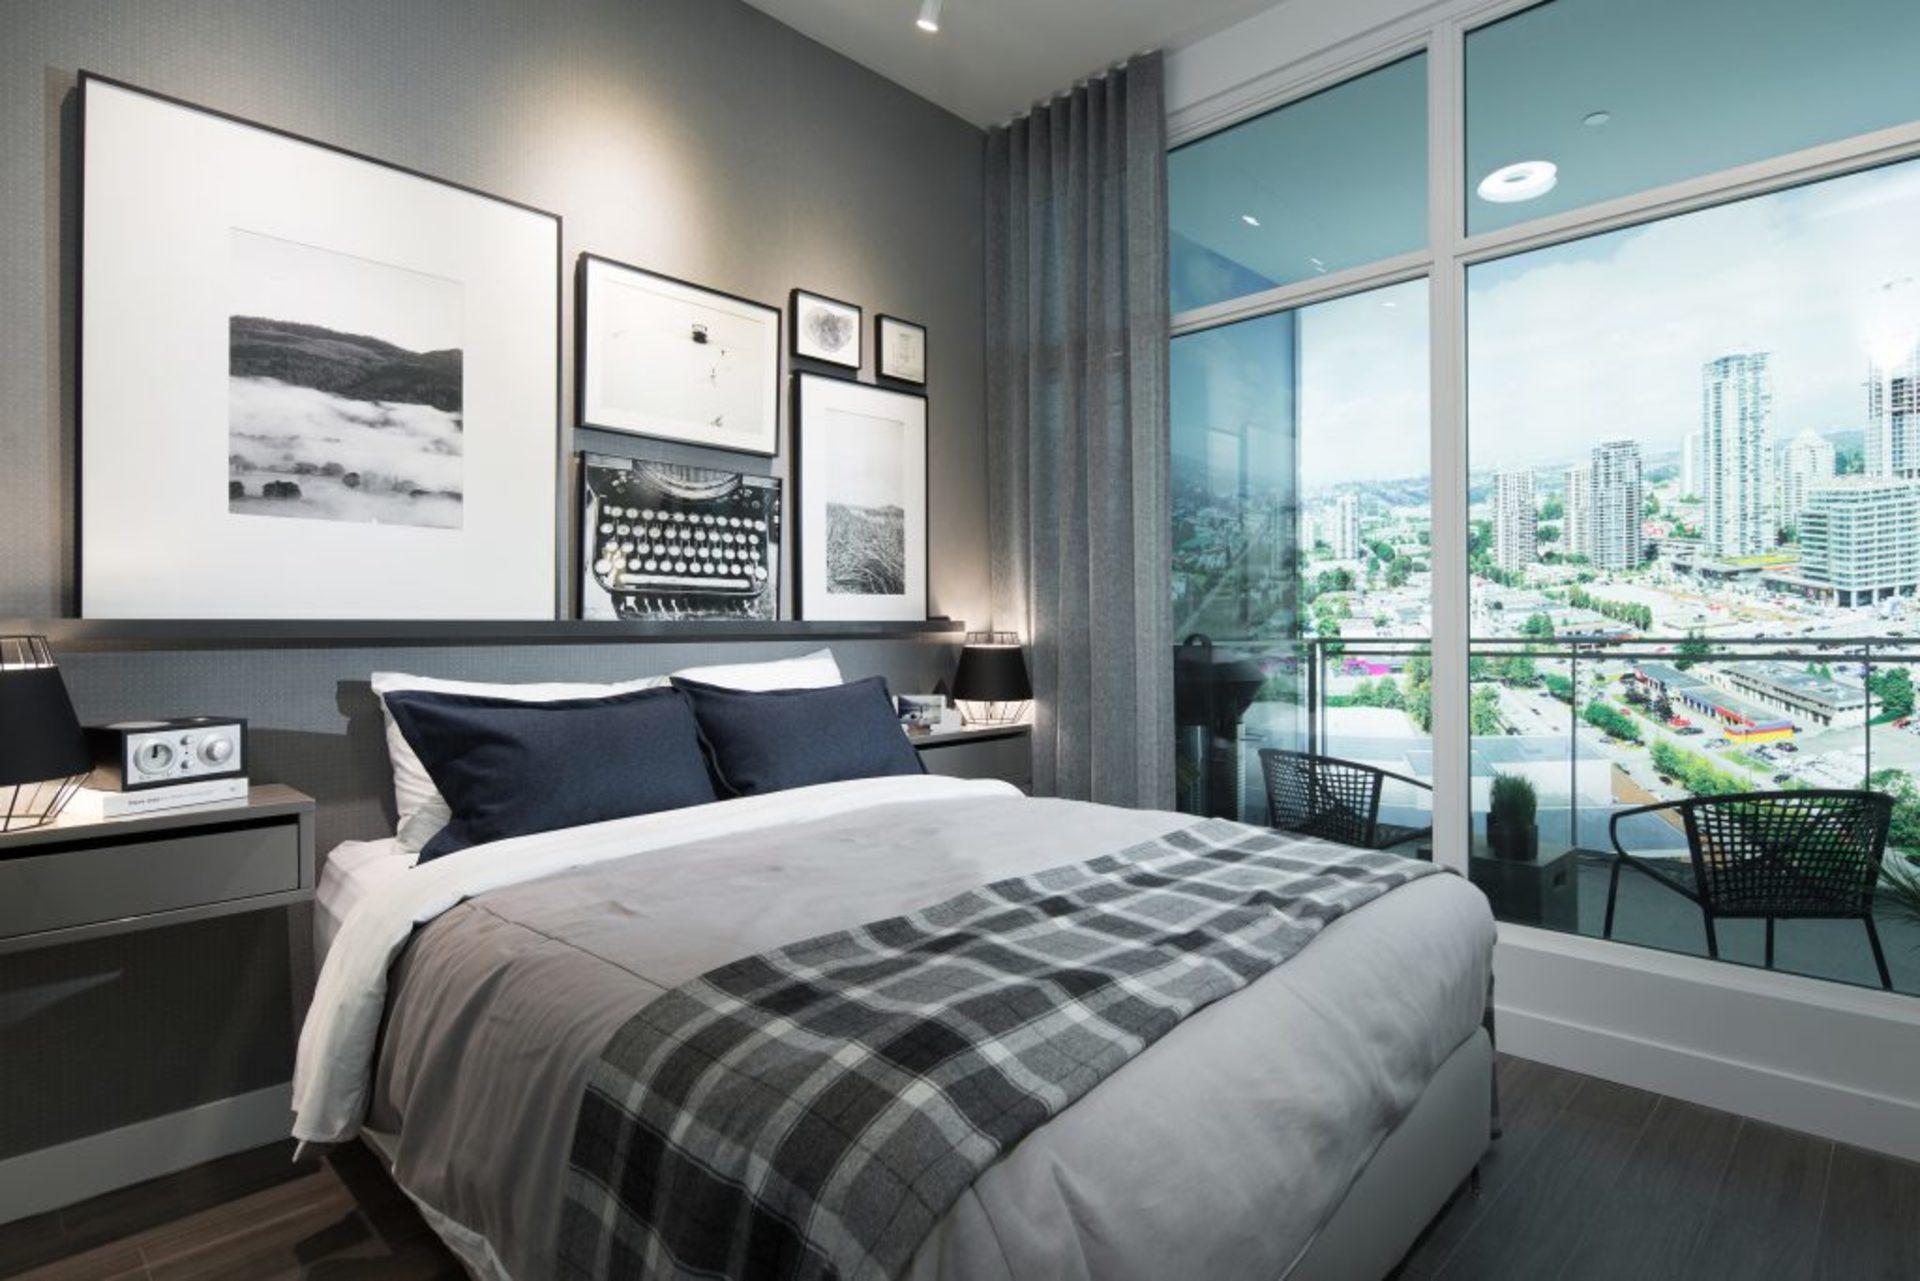 lumina-beroom at Waterfall  -  Lumina (2425 Beta Avenue, Brentwood Park, Burnaby North)